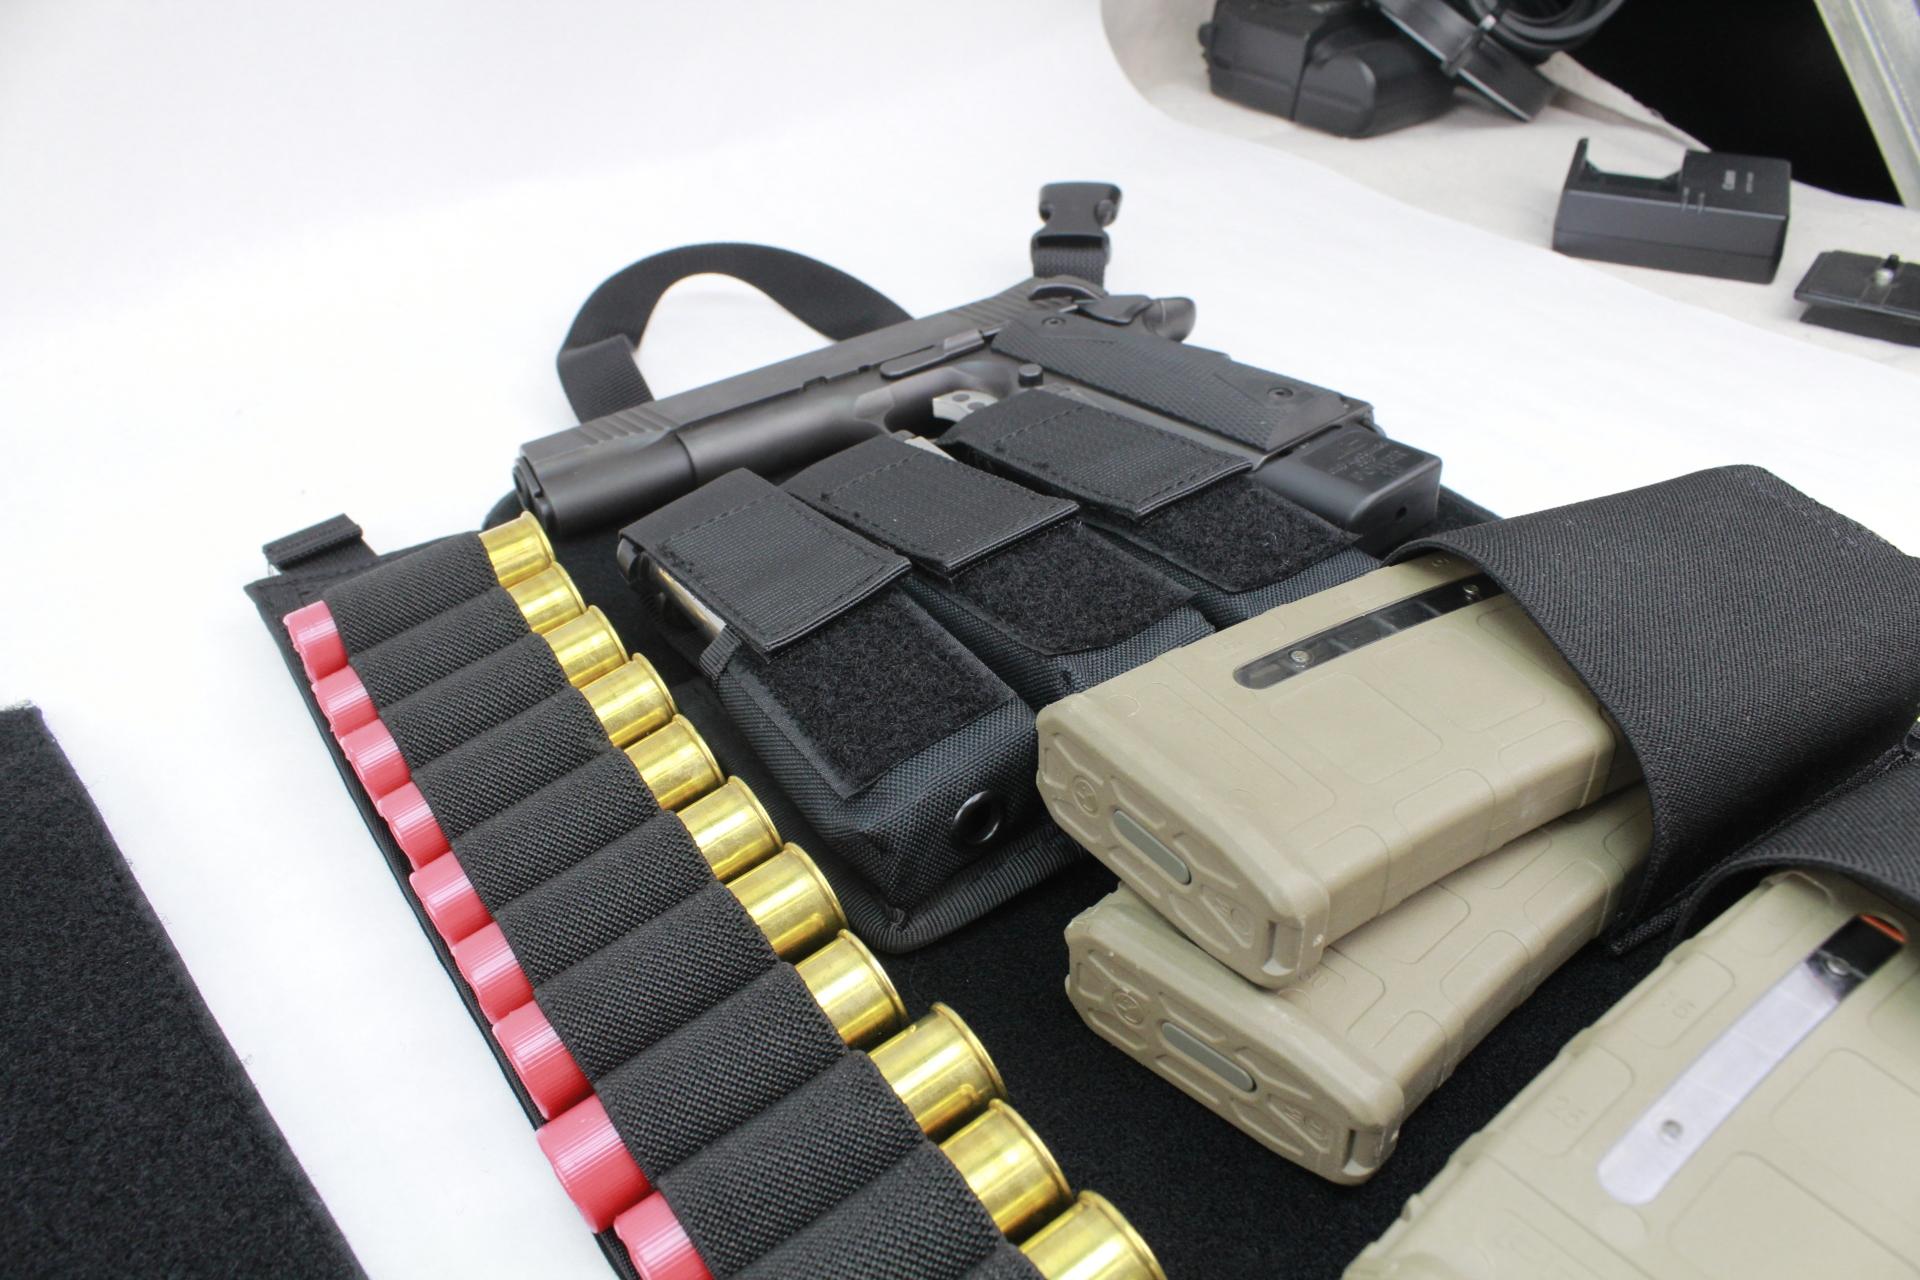 Large Tactical DASH bag panel view